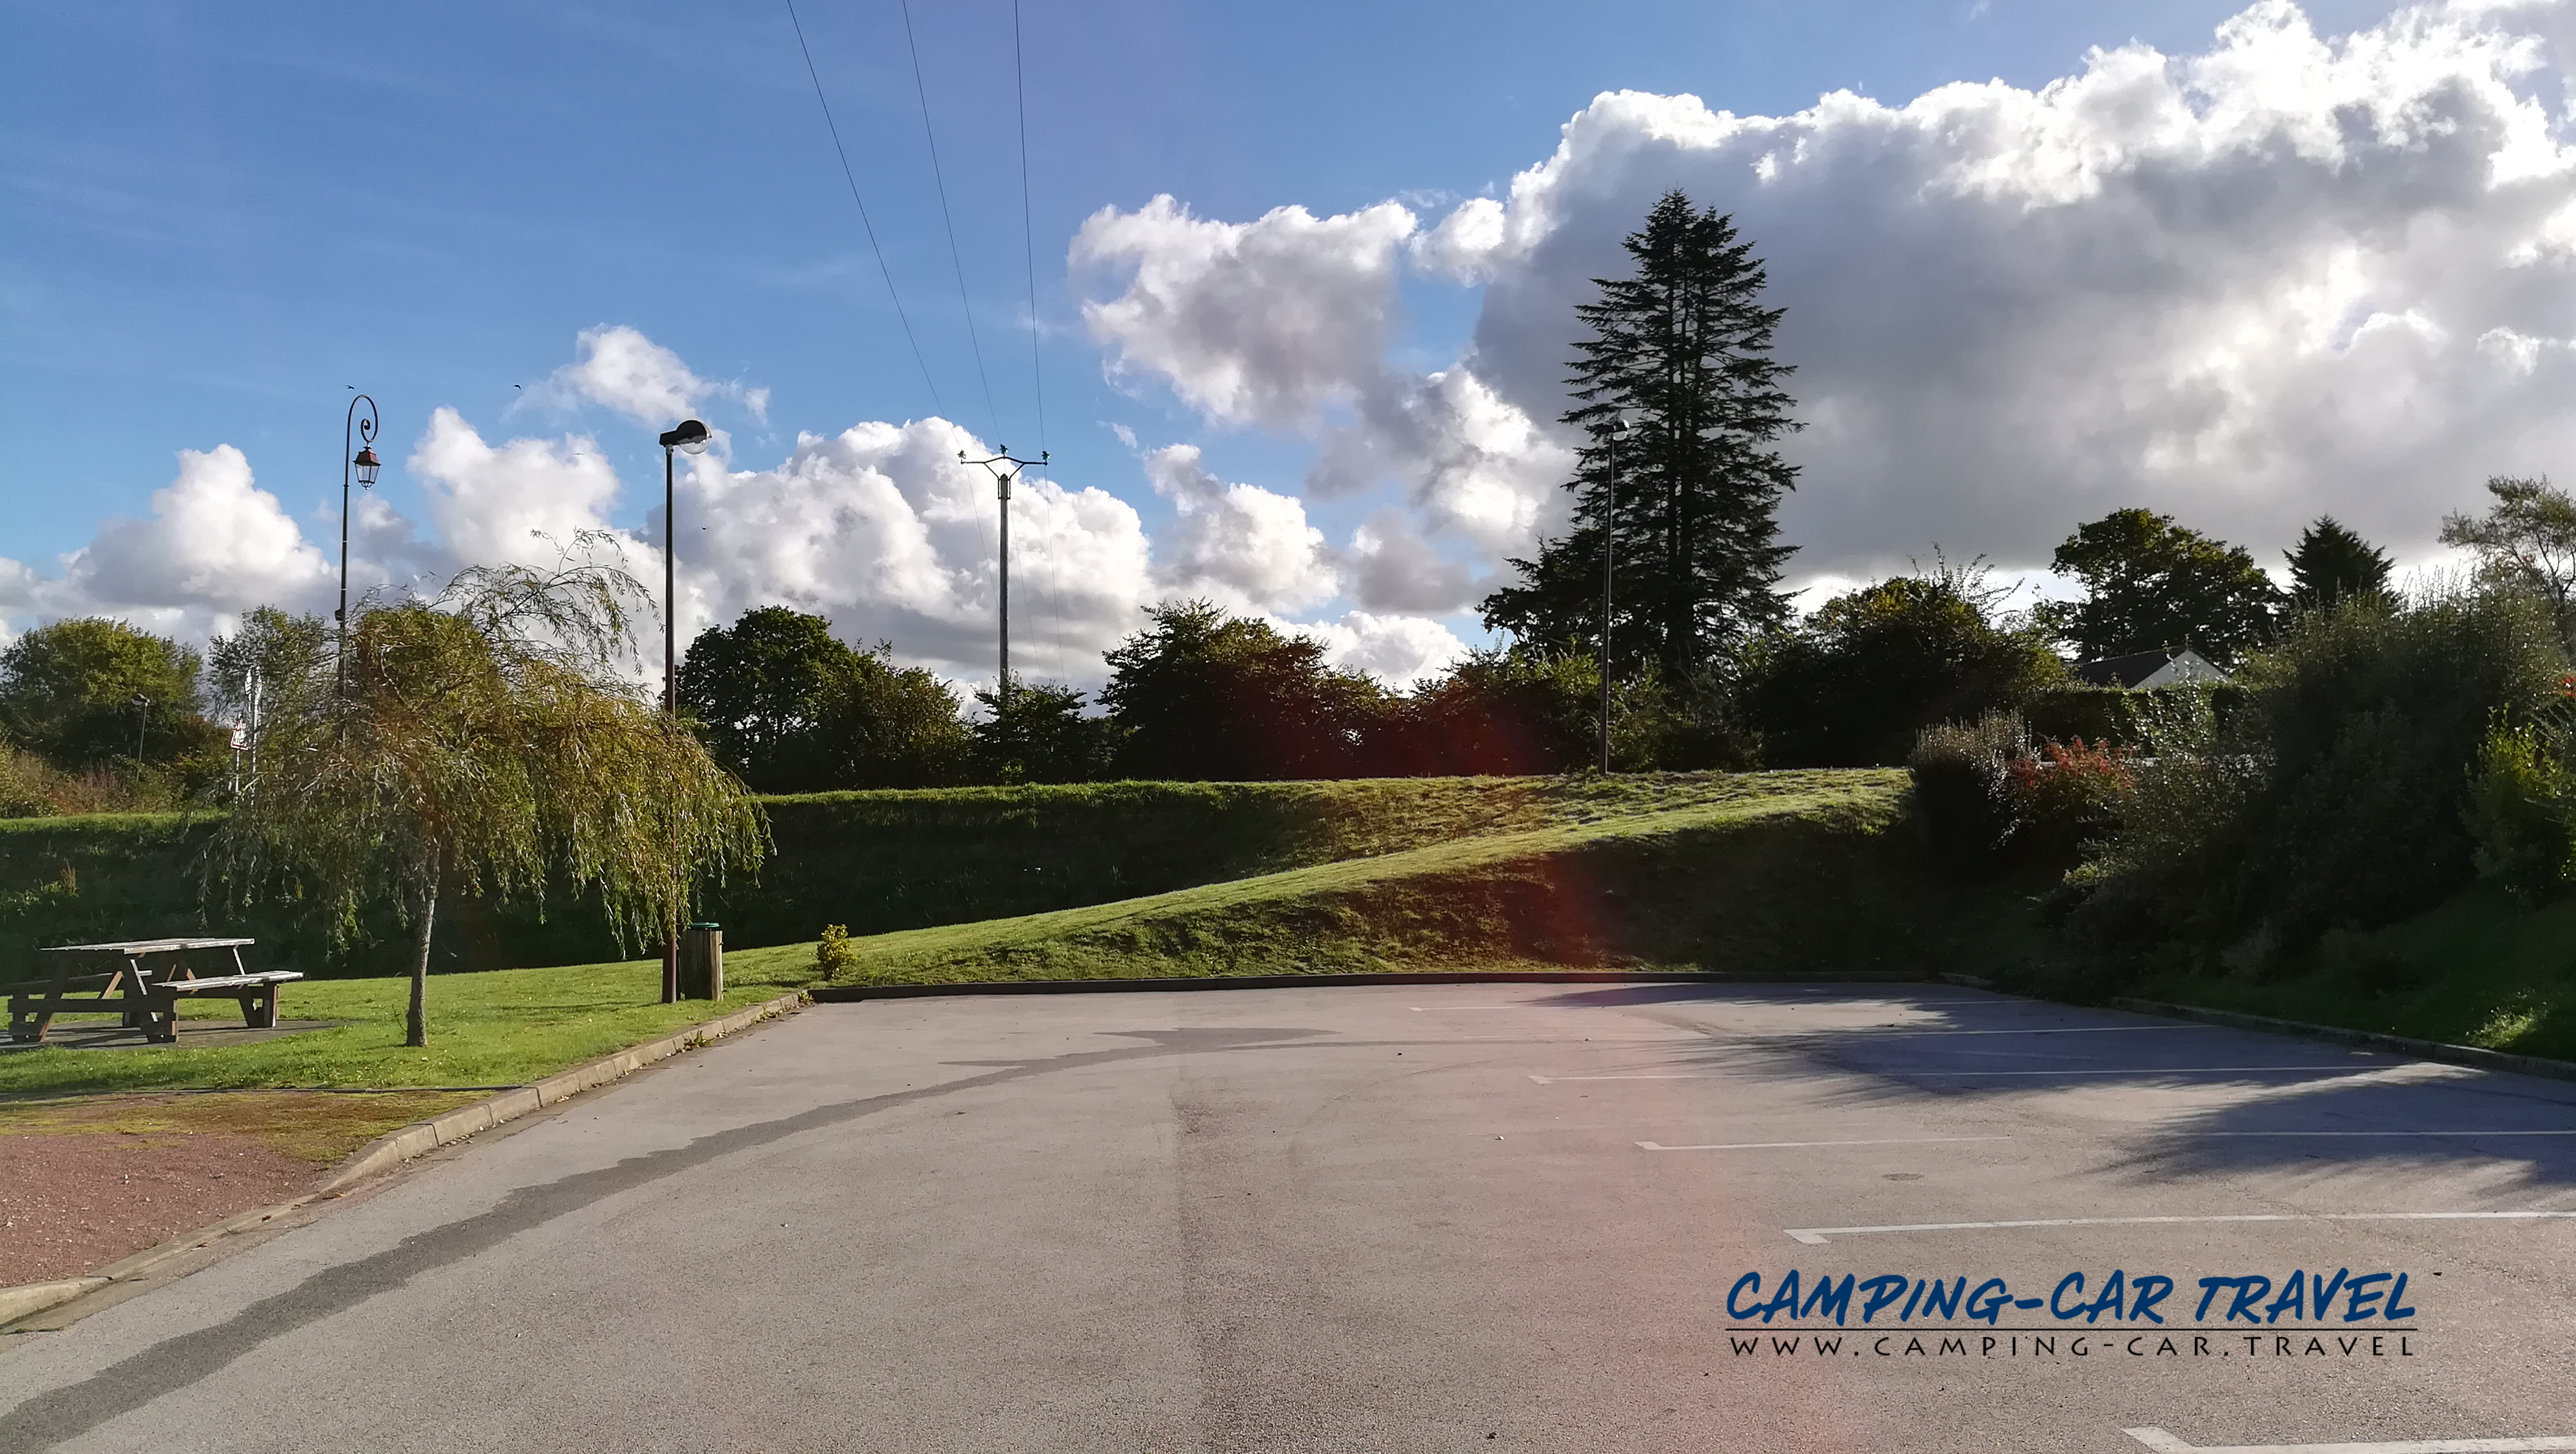 aire services camping car Rauville-la-Bigot Manche Normandie